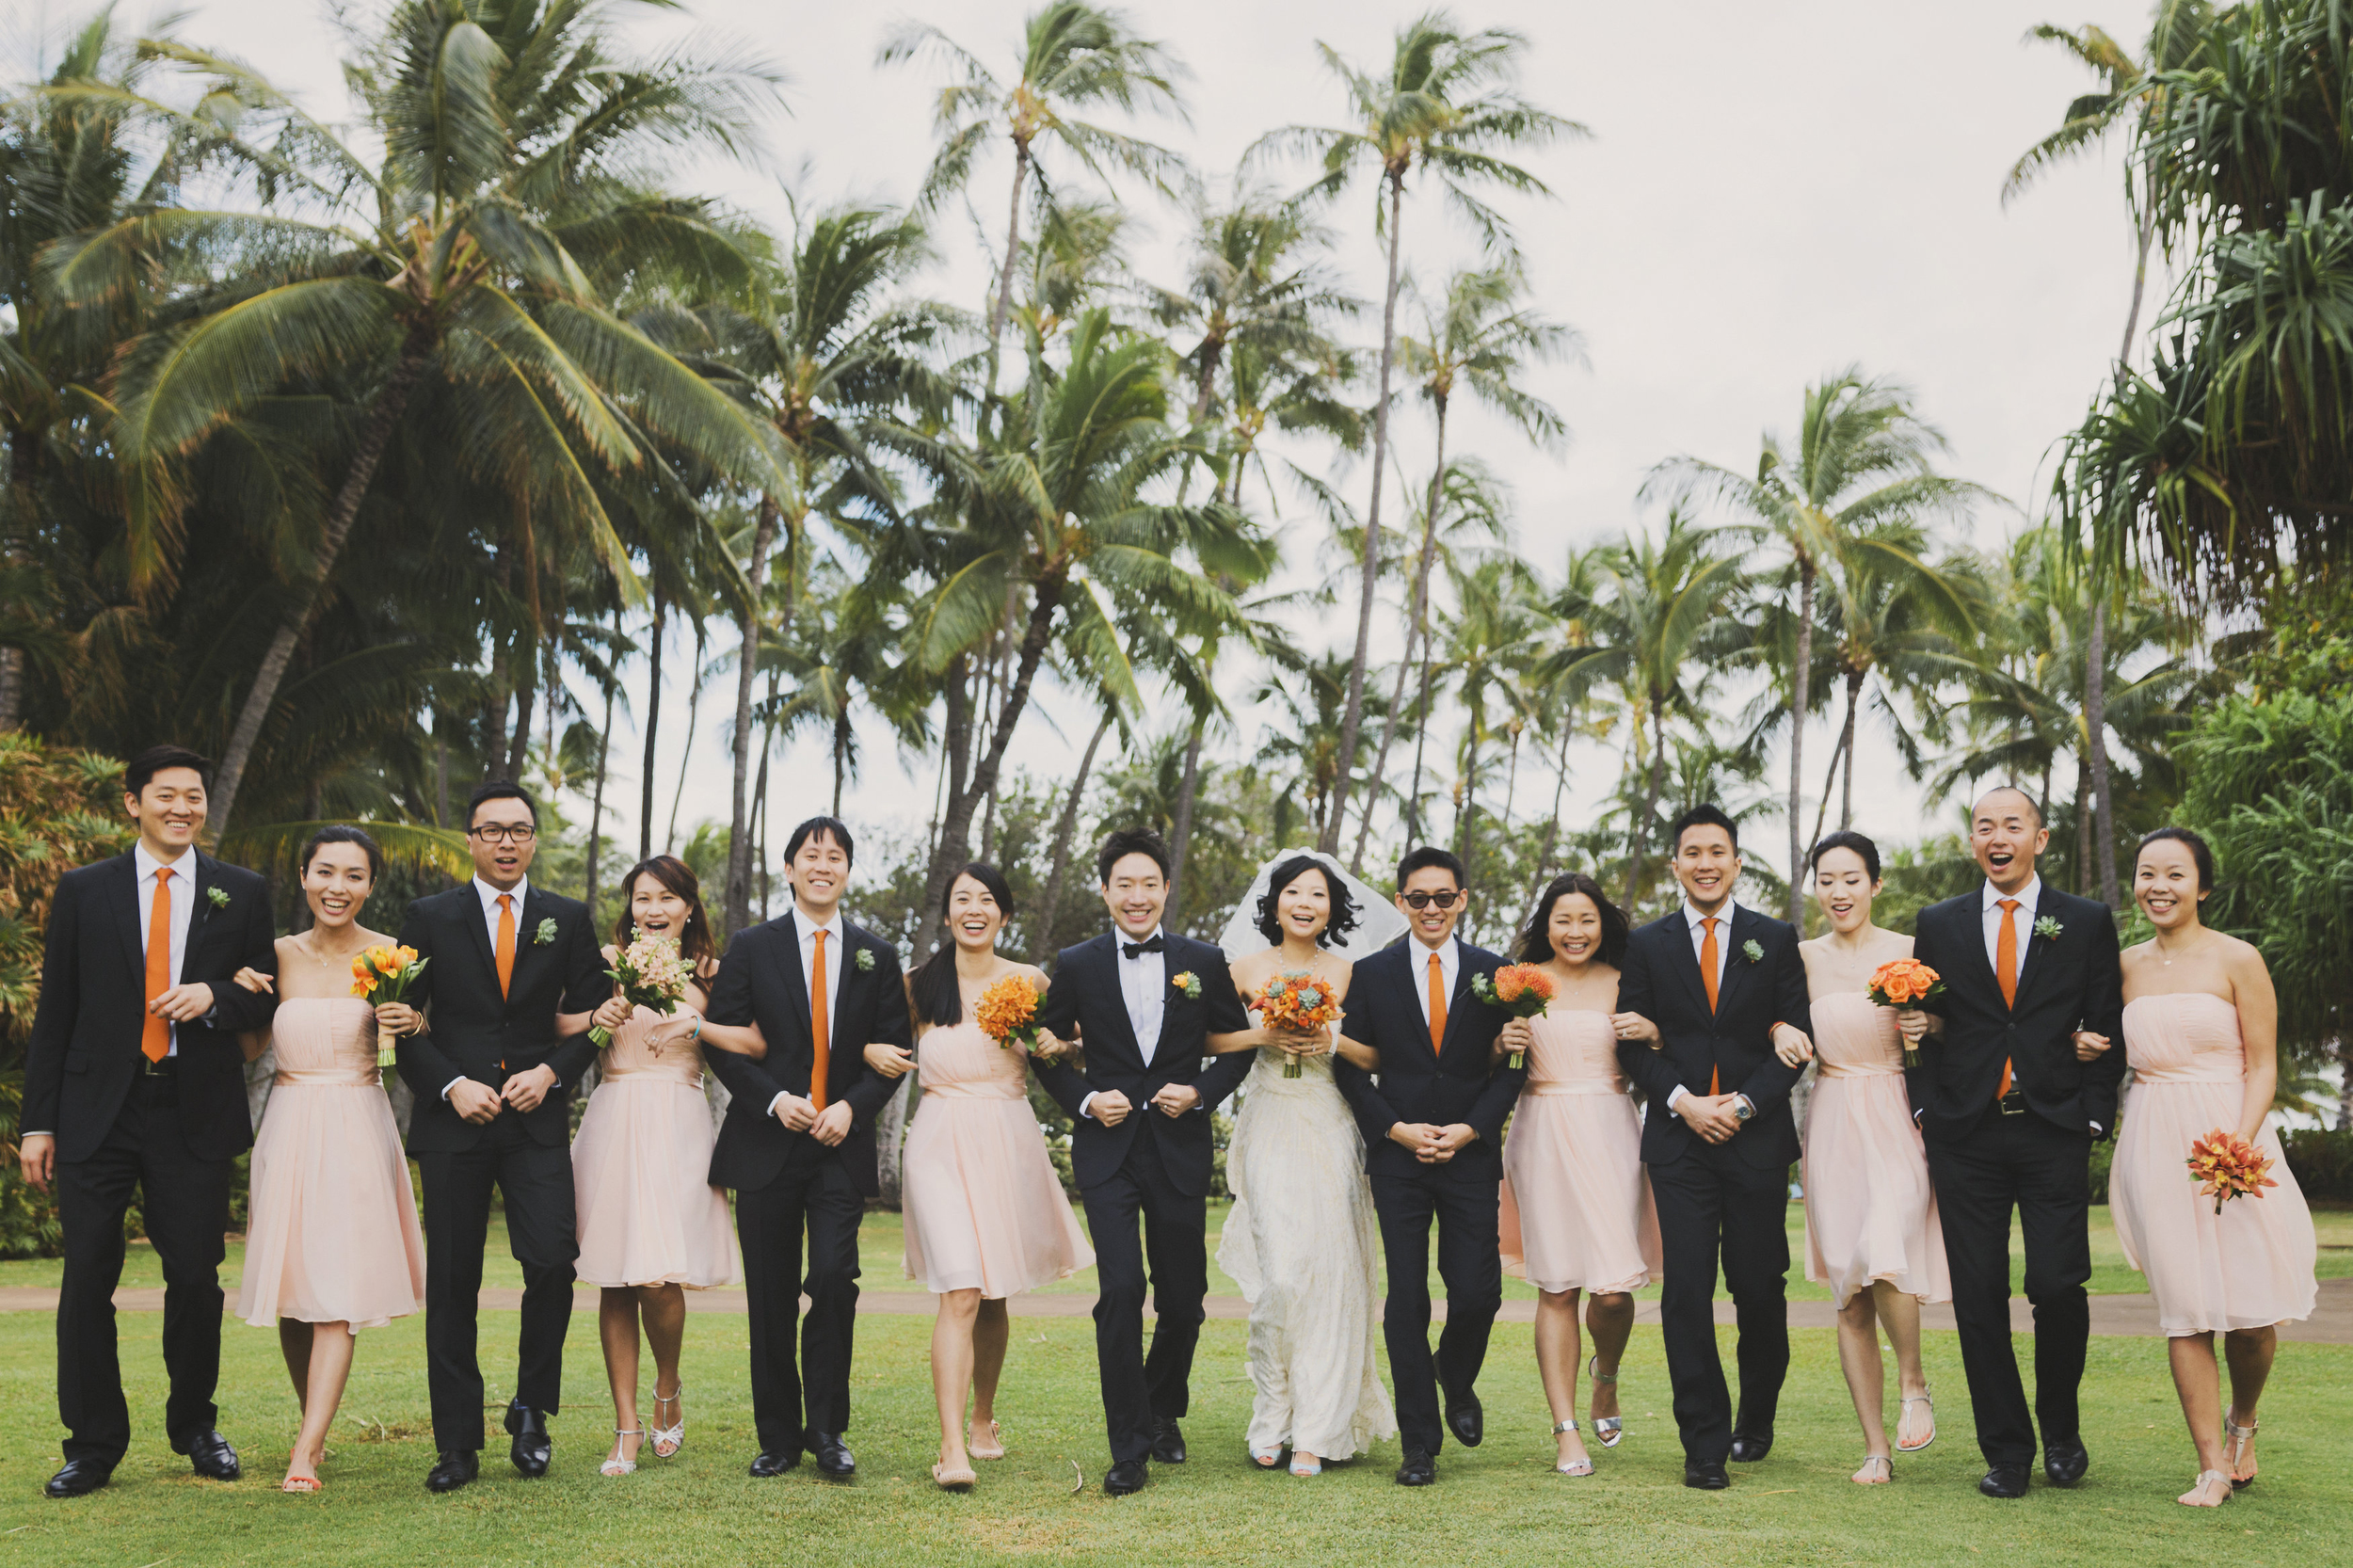 angie-diaz-photography-oahu-wedding-lanikuhonoa-shenshen-marshall-37.jpg